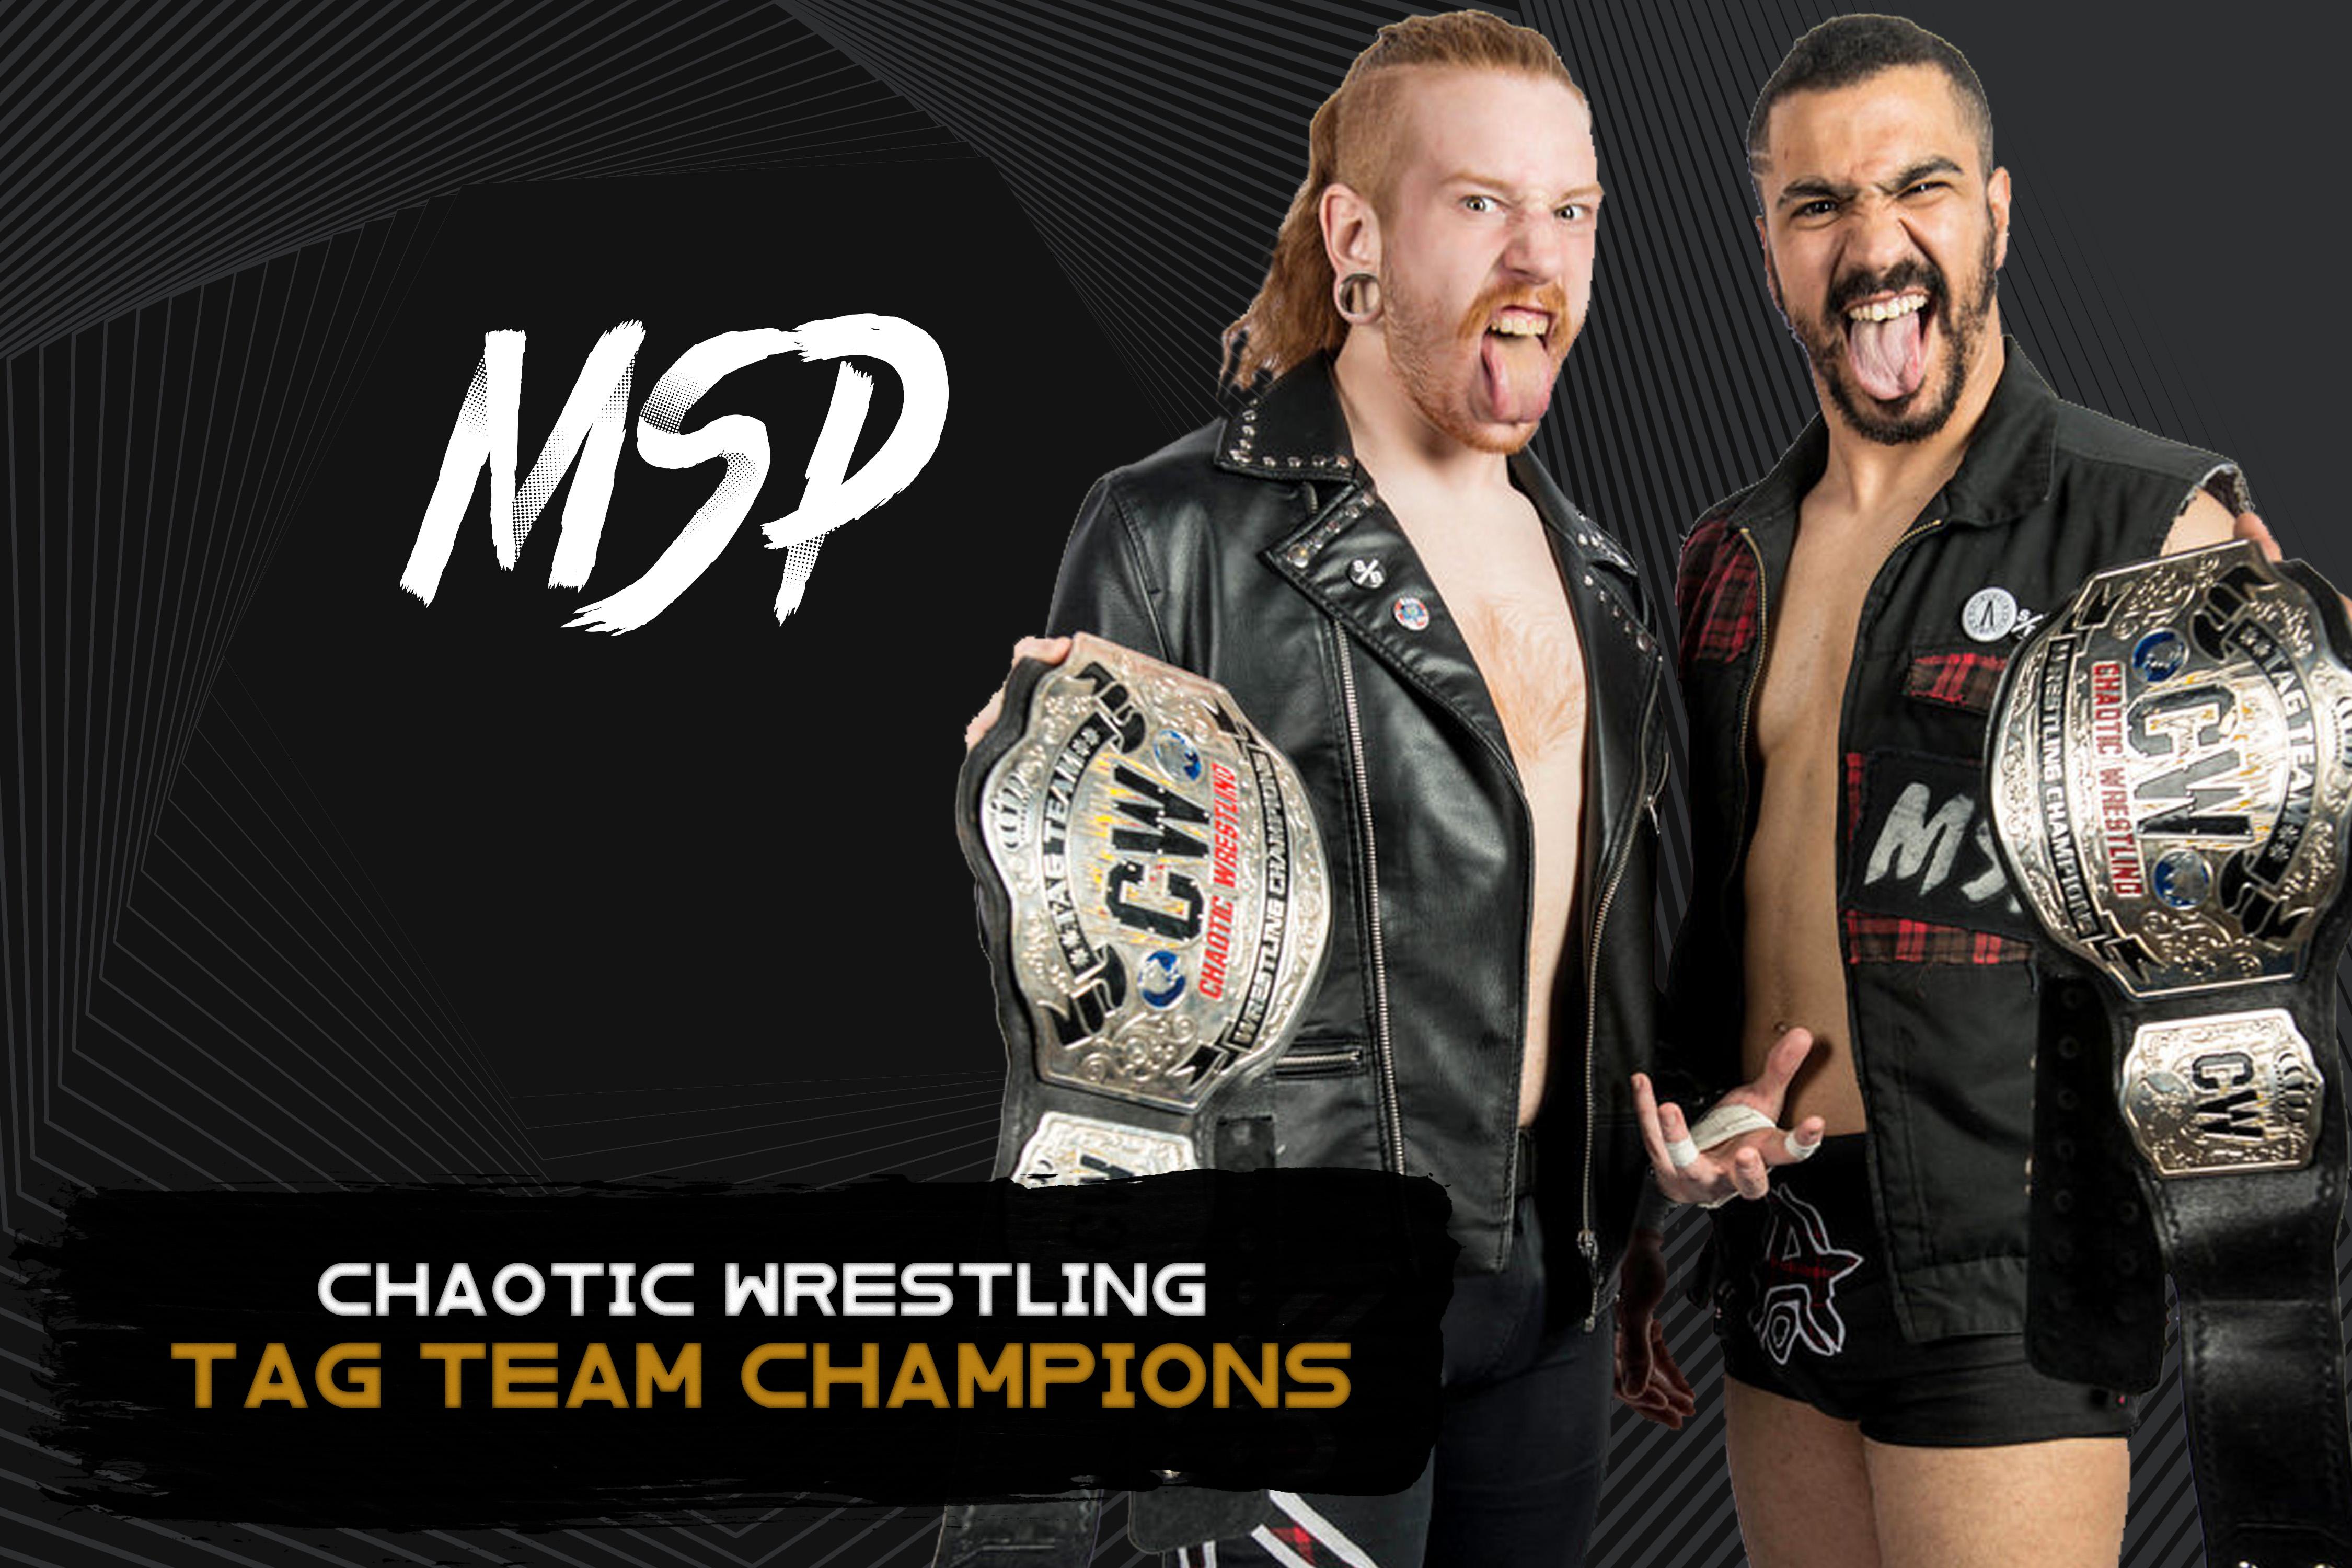 msp - tag champs